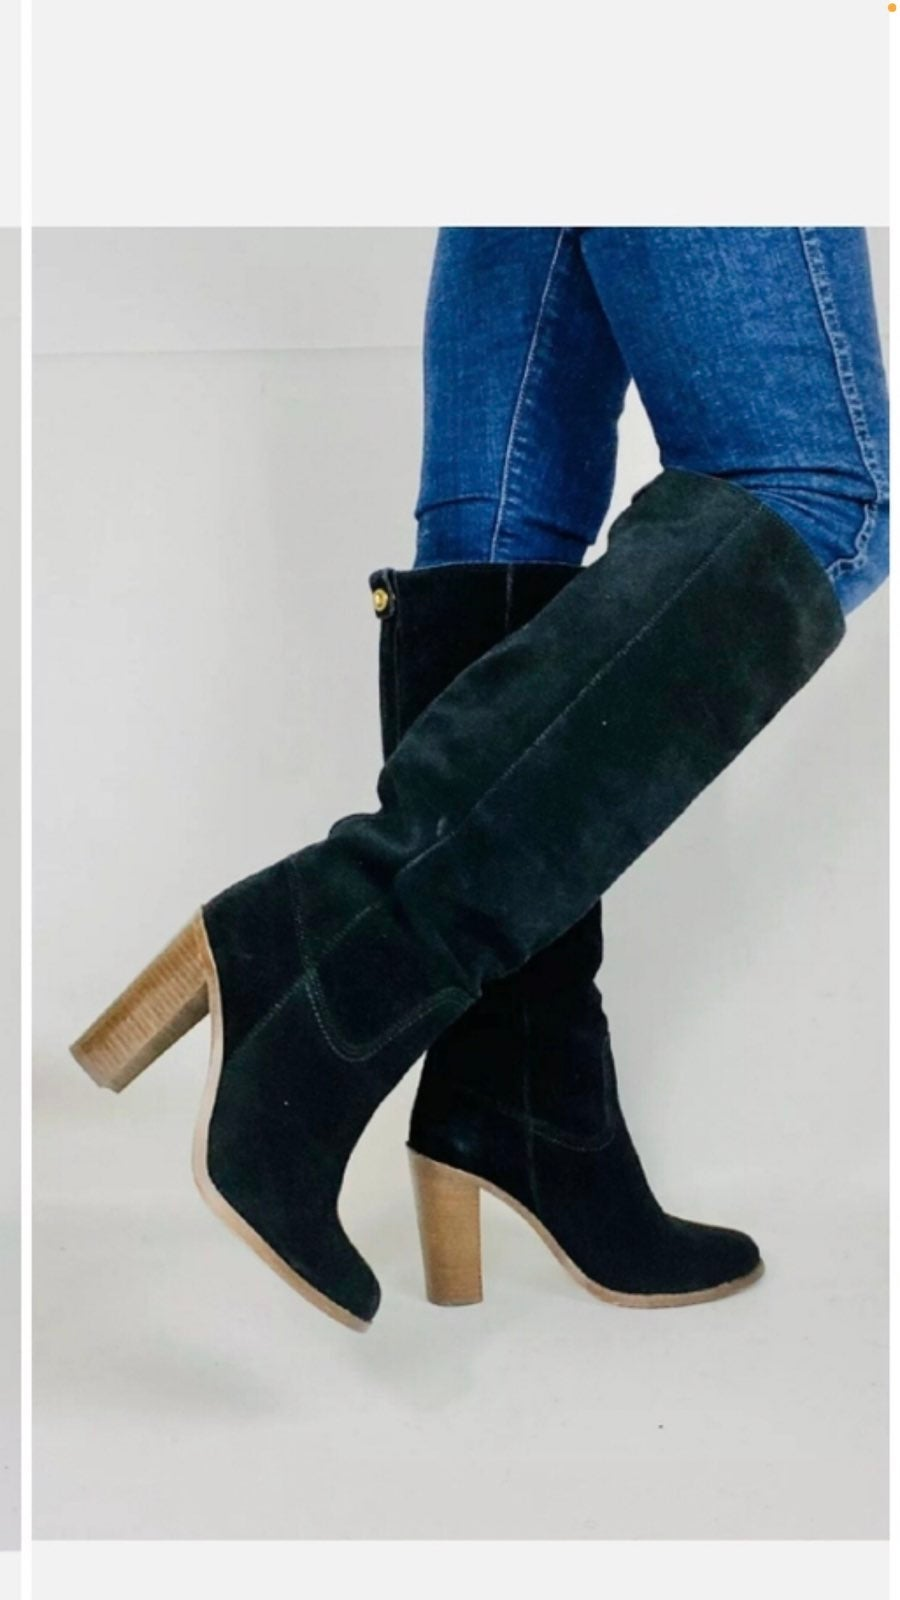 Coach Black Suede Effie Knee High Boots